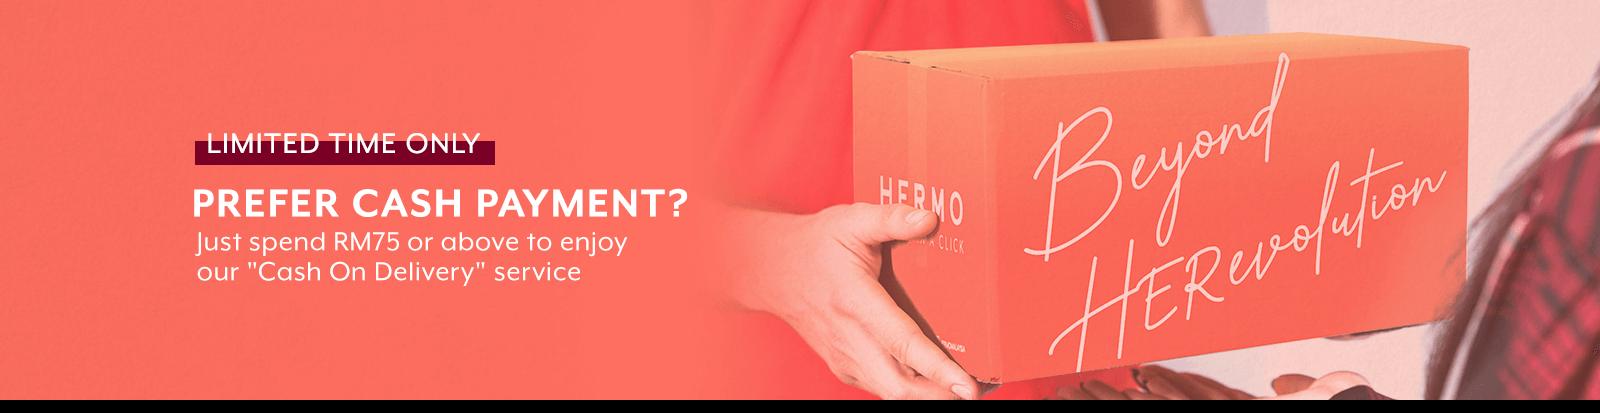 Hermo 612 cod